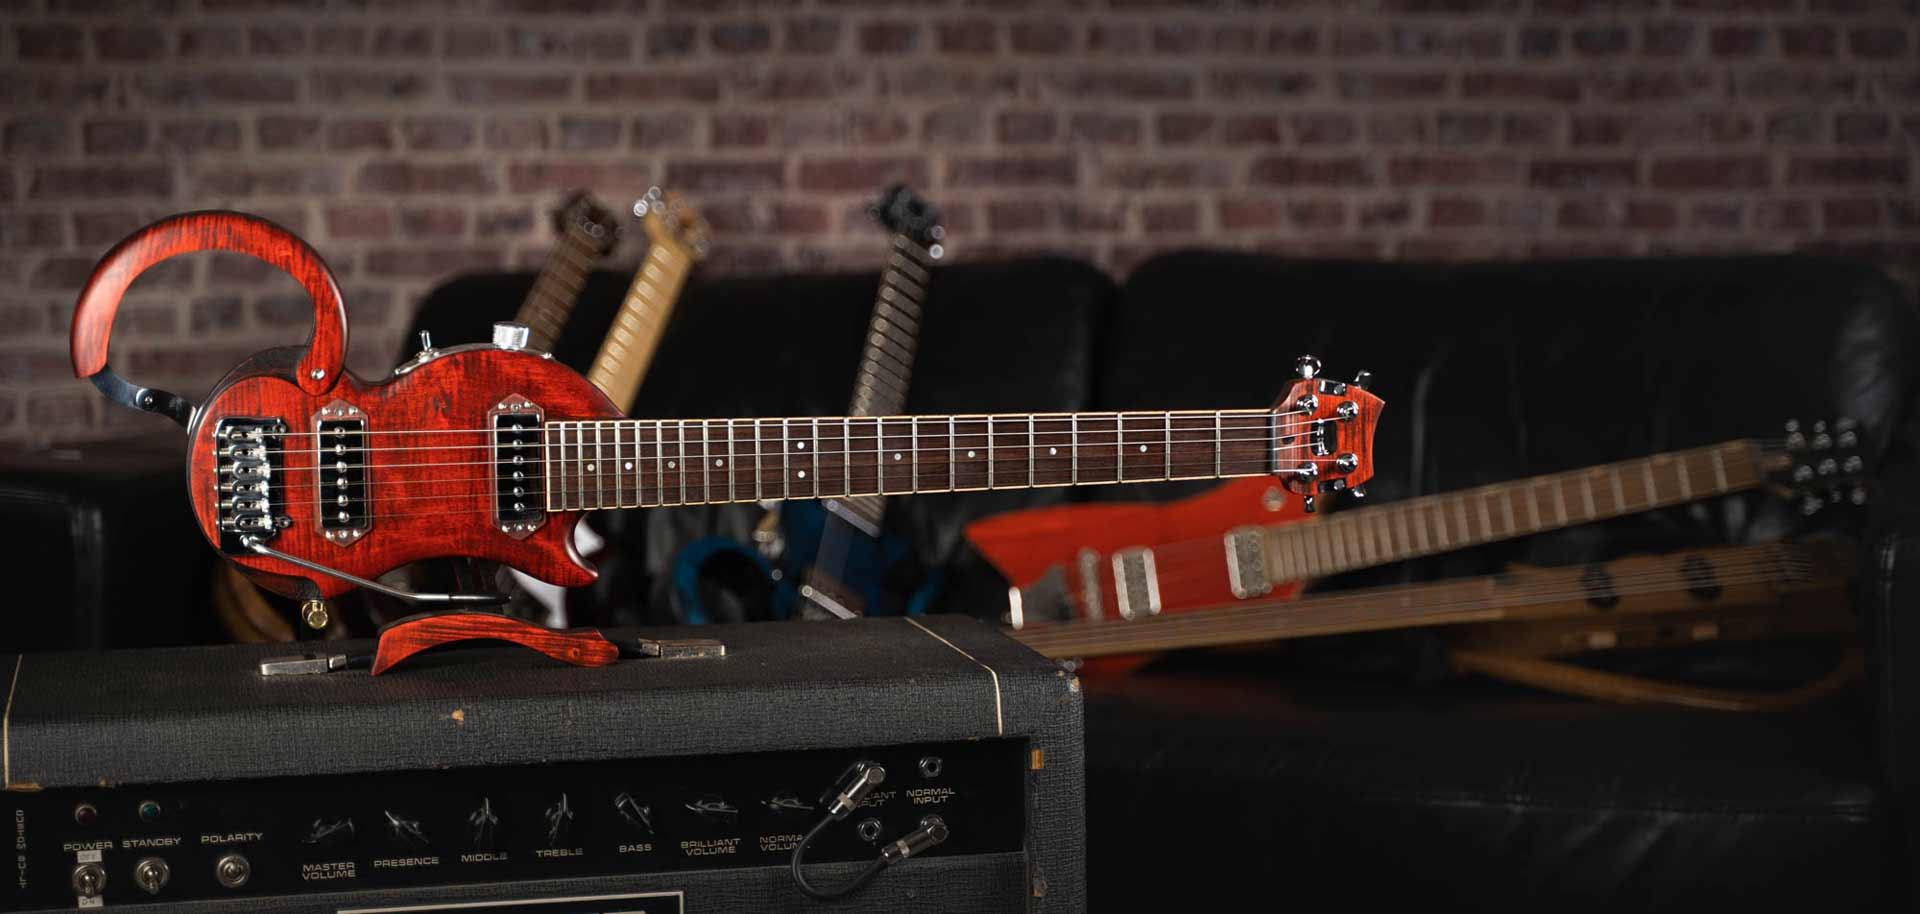 guitare-de-voyage-electrique-electric-travel-guitar